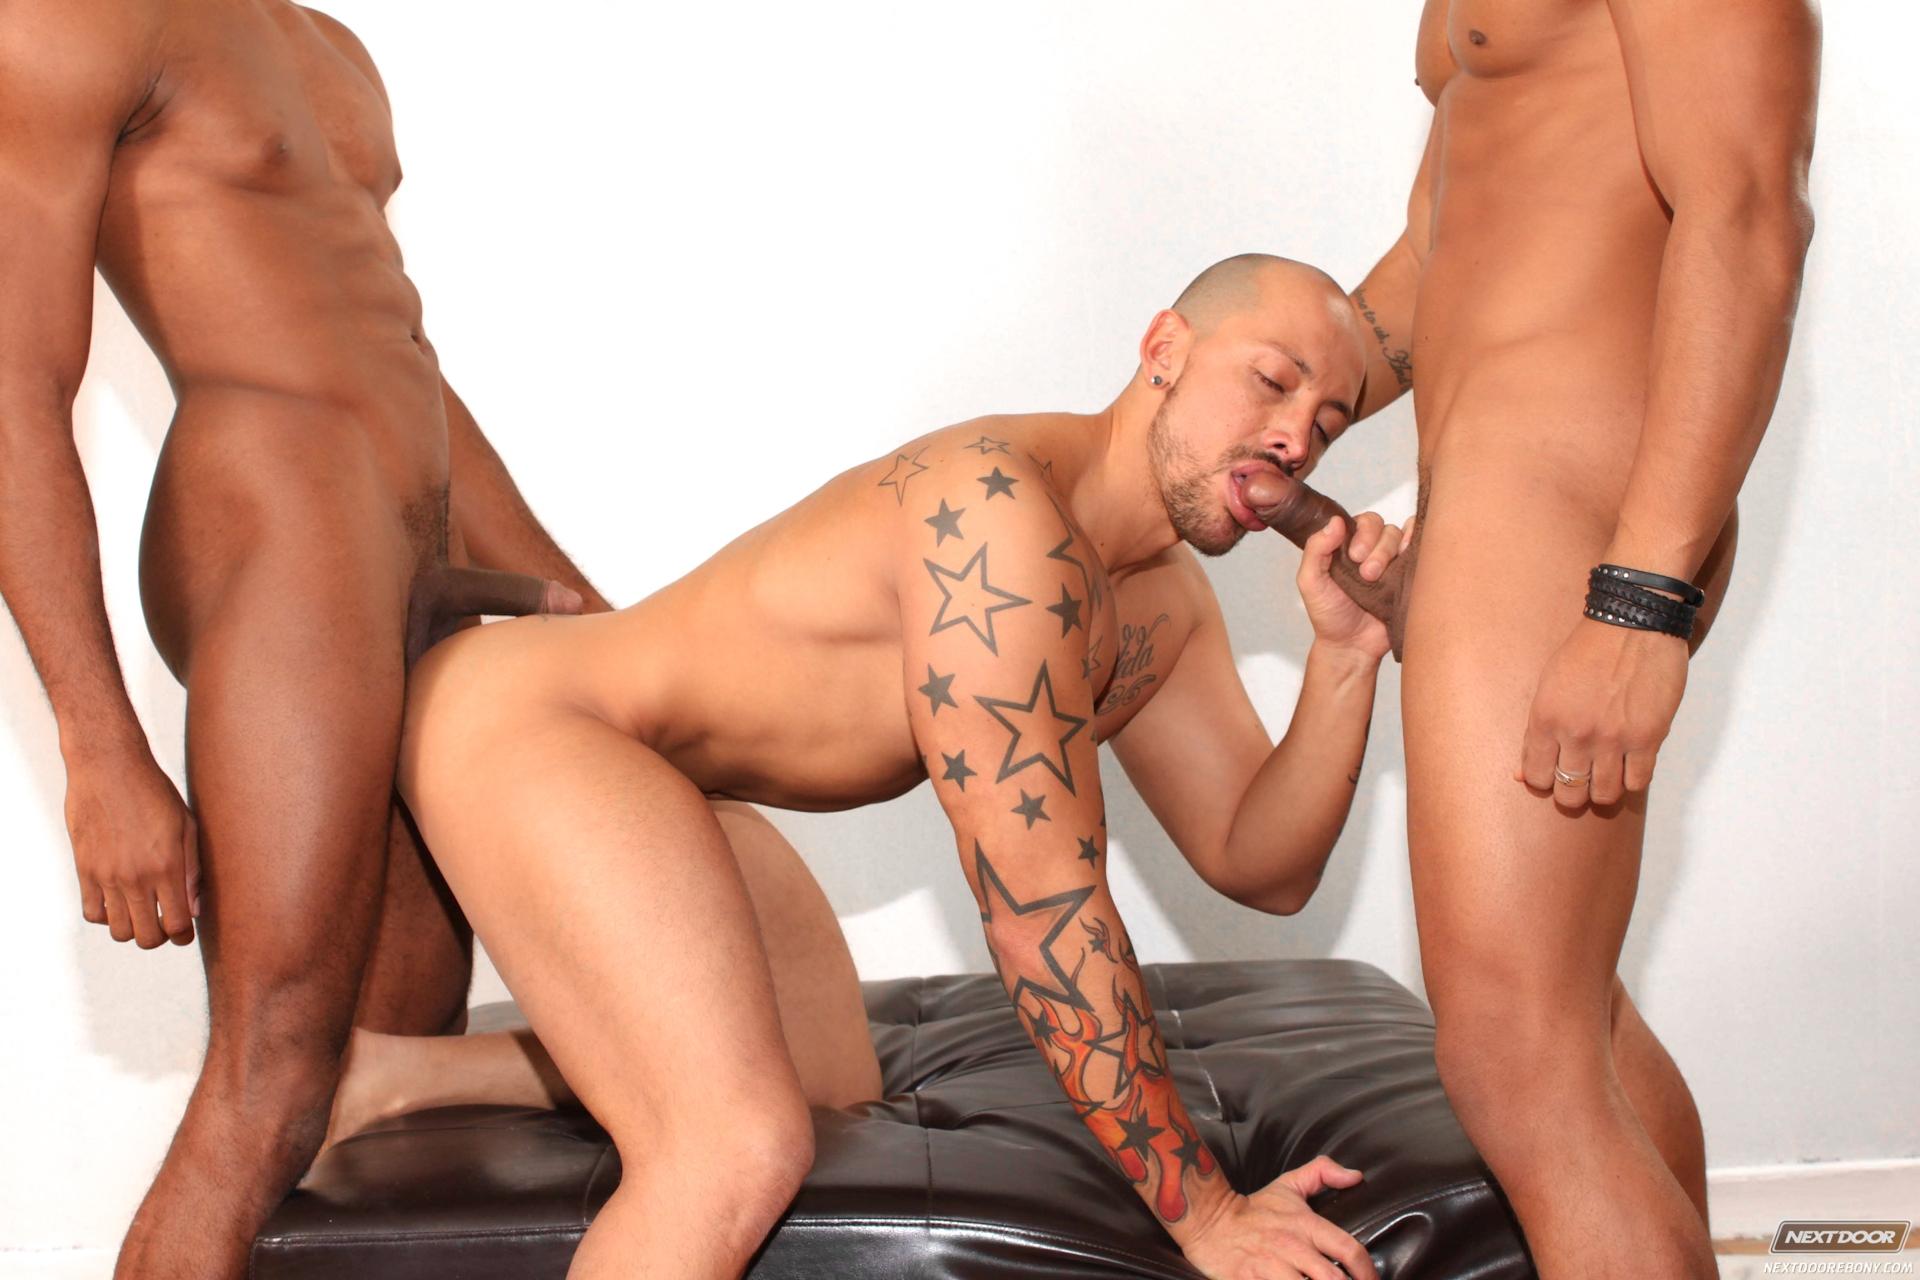 Gay black hardcore fucking and kissing 6